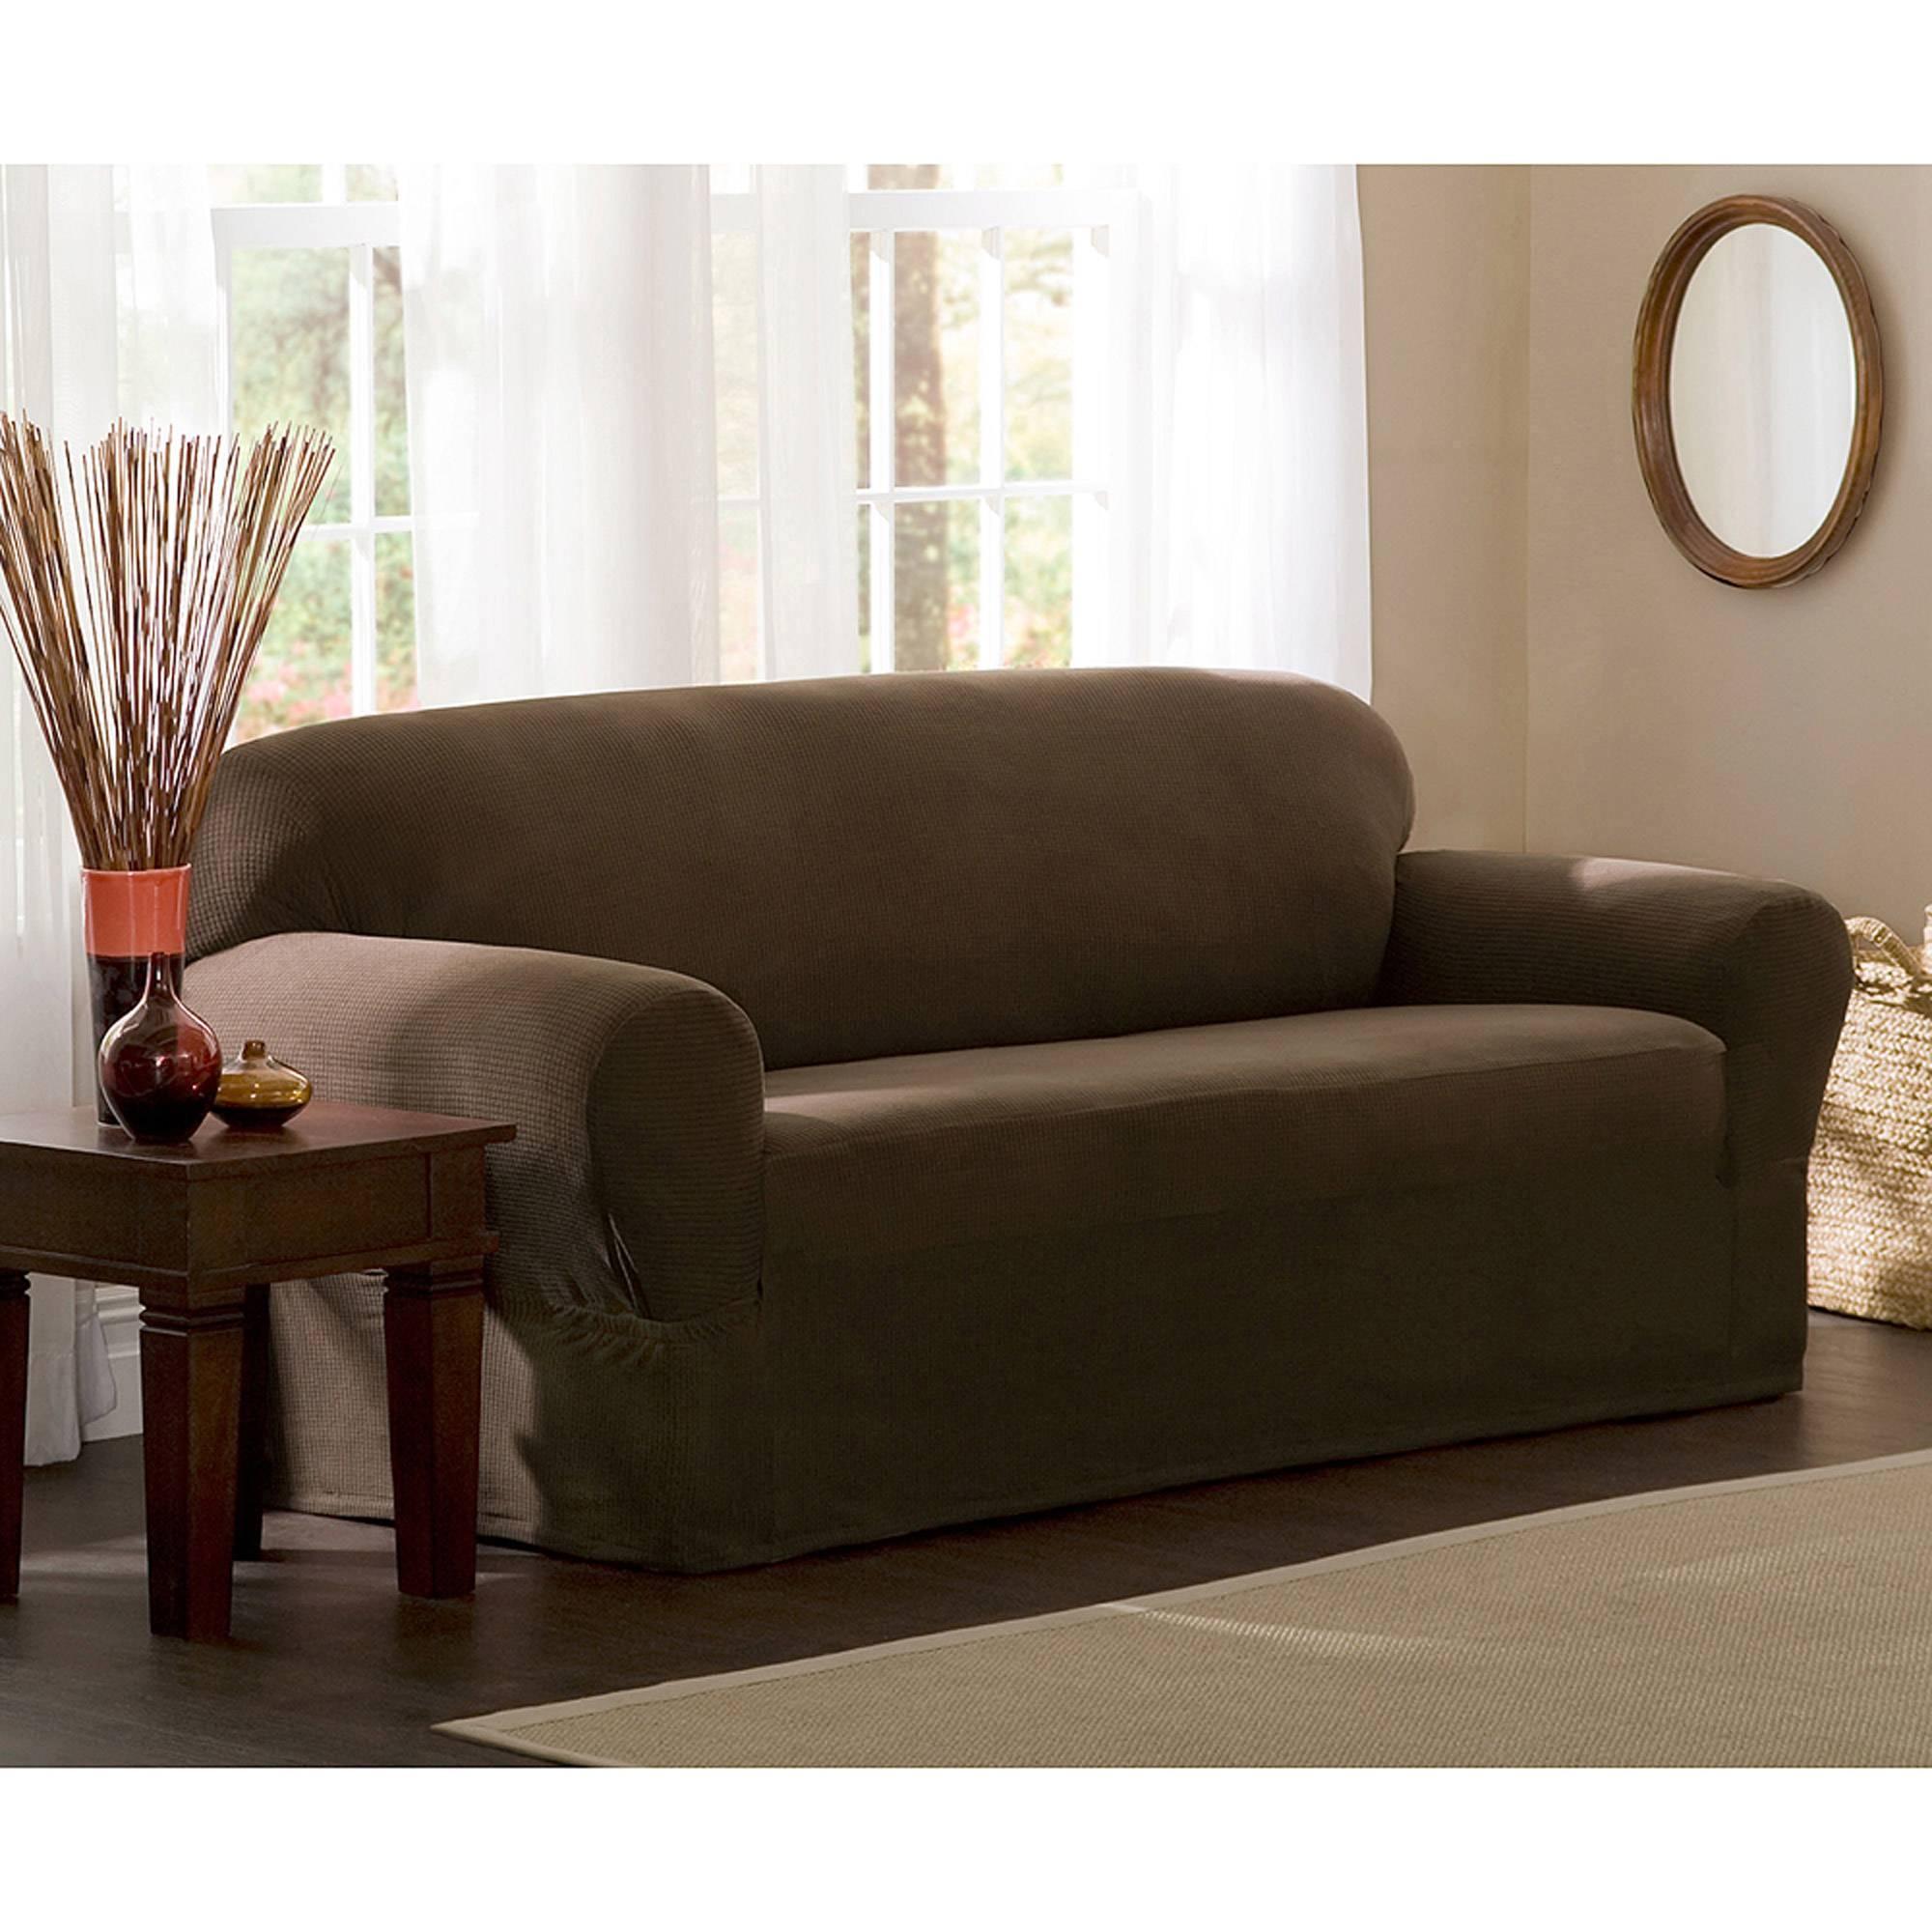 Mainstays 1-Piece Stretch Fabric Sofa Slipcover - Walmart for Wallmart Sofa (Image 17 of 25)